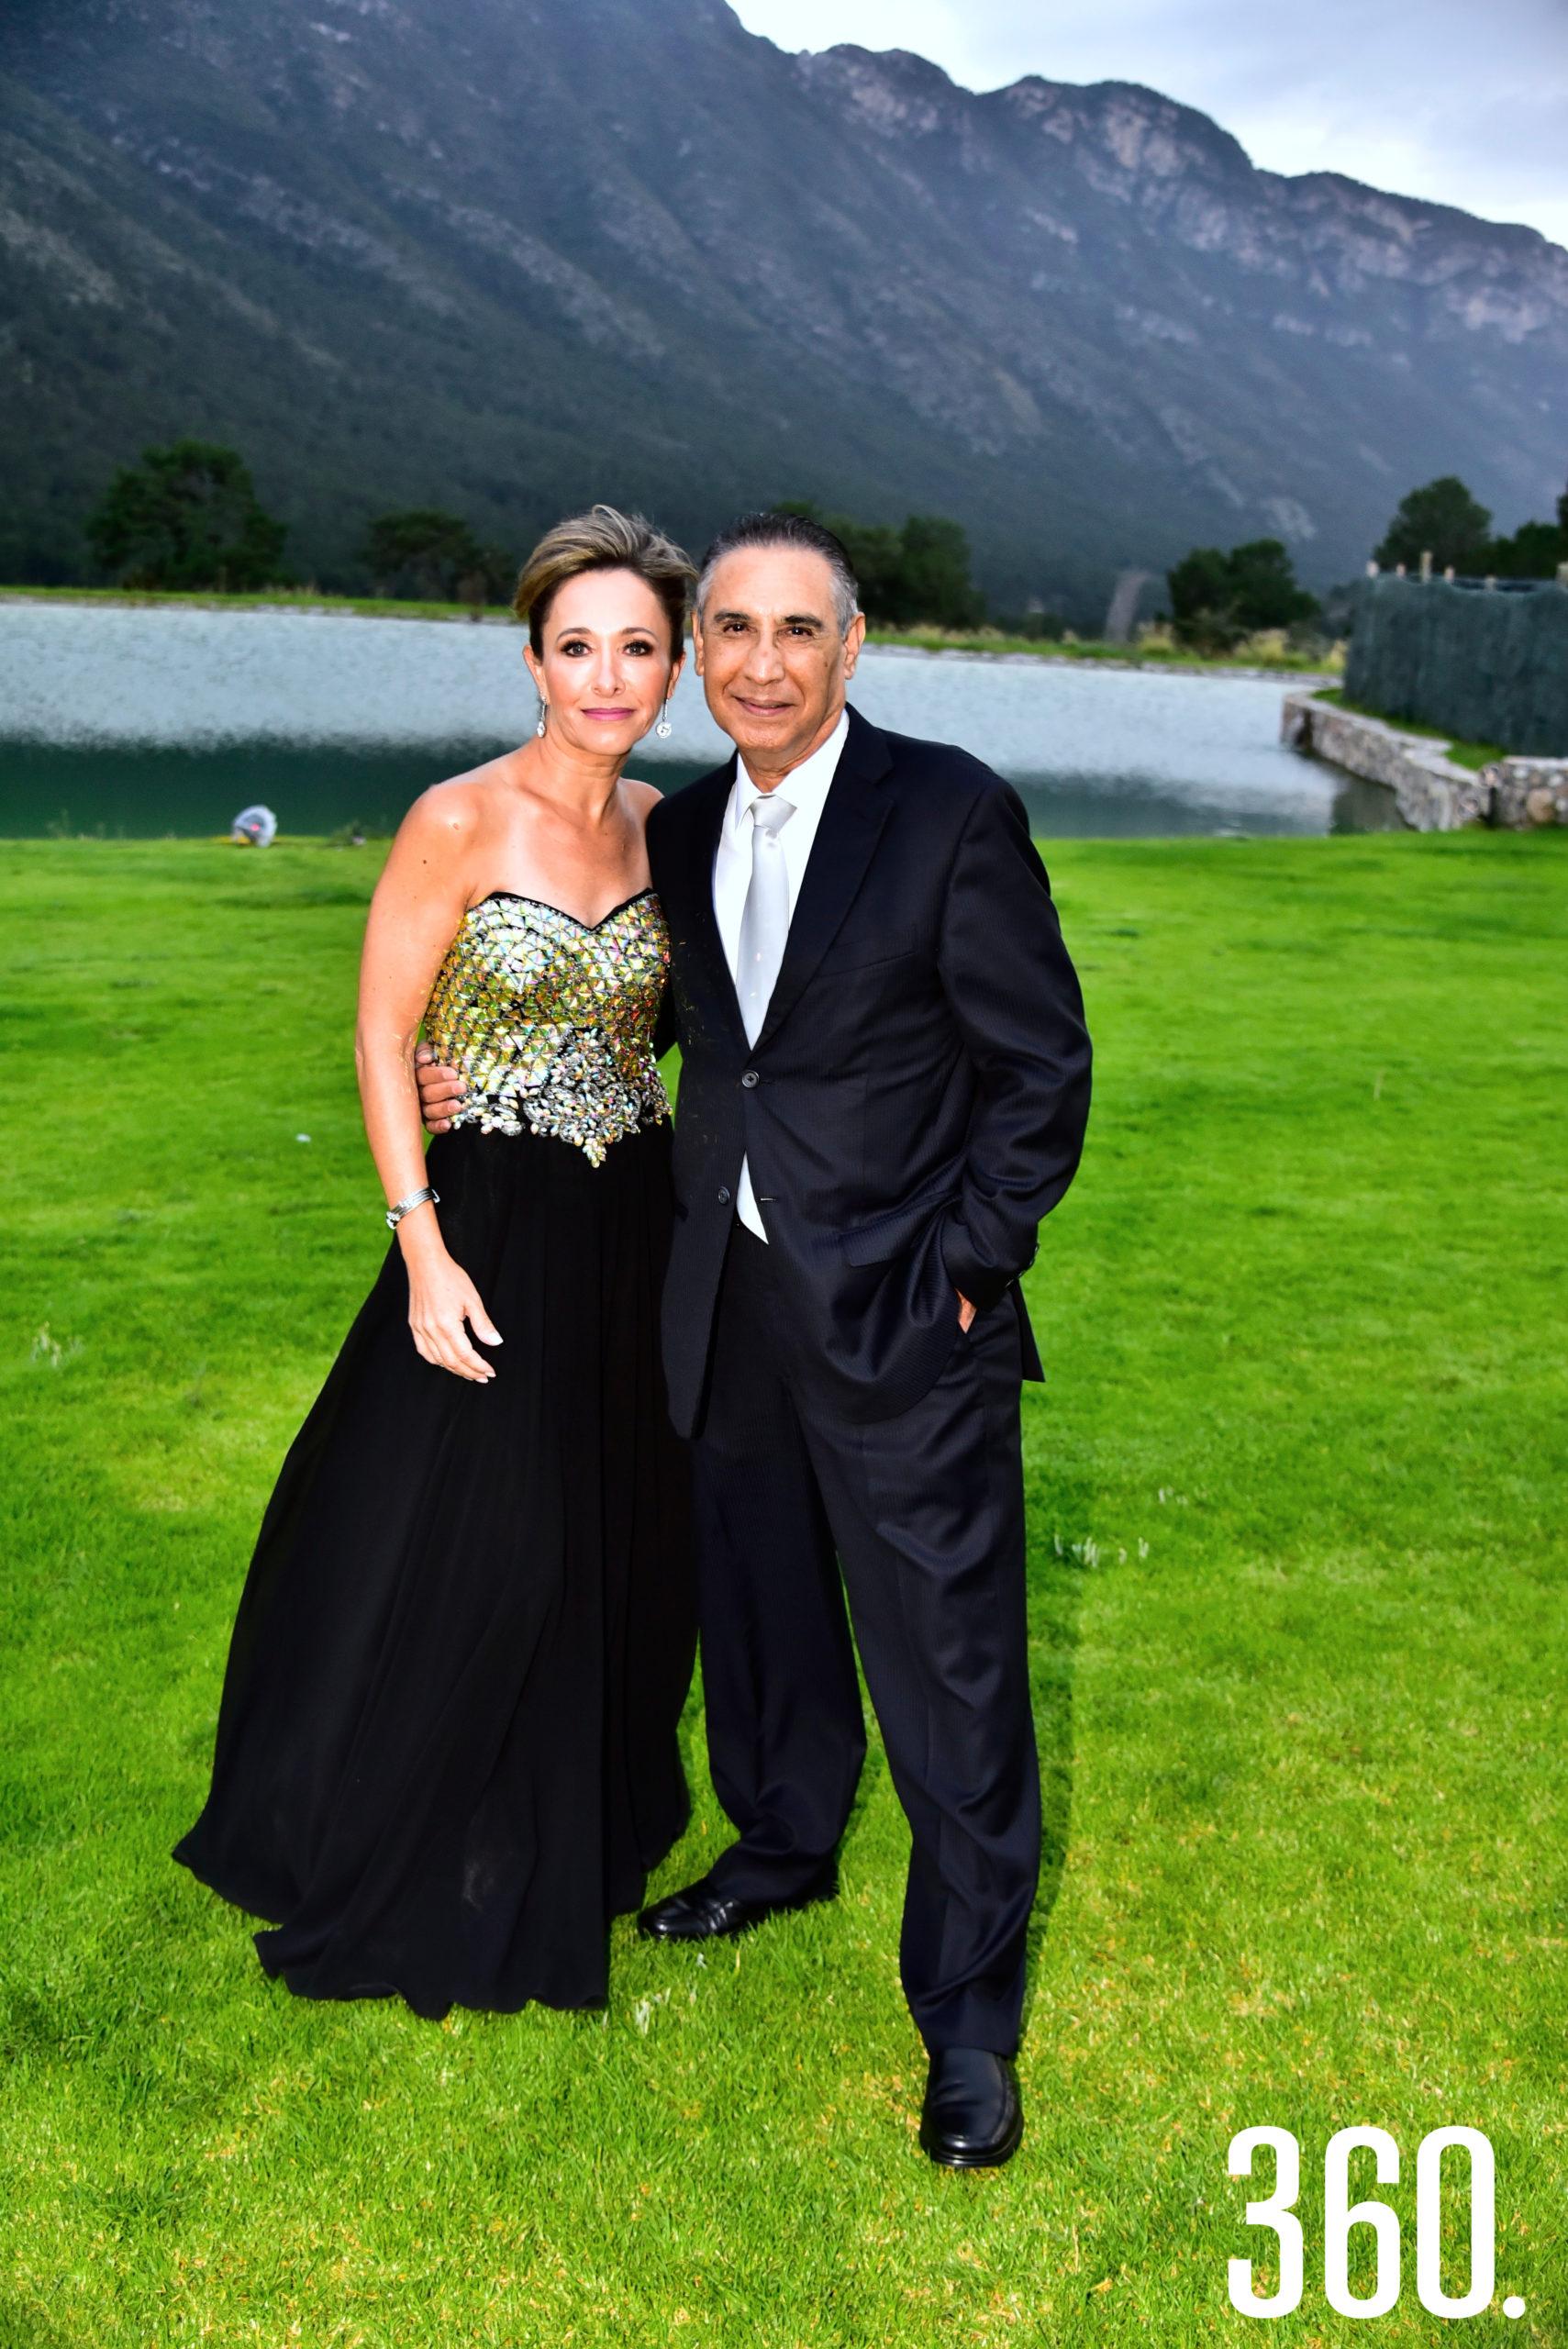 Anabel Favila y Roberto Favila.